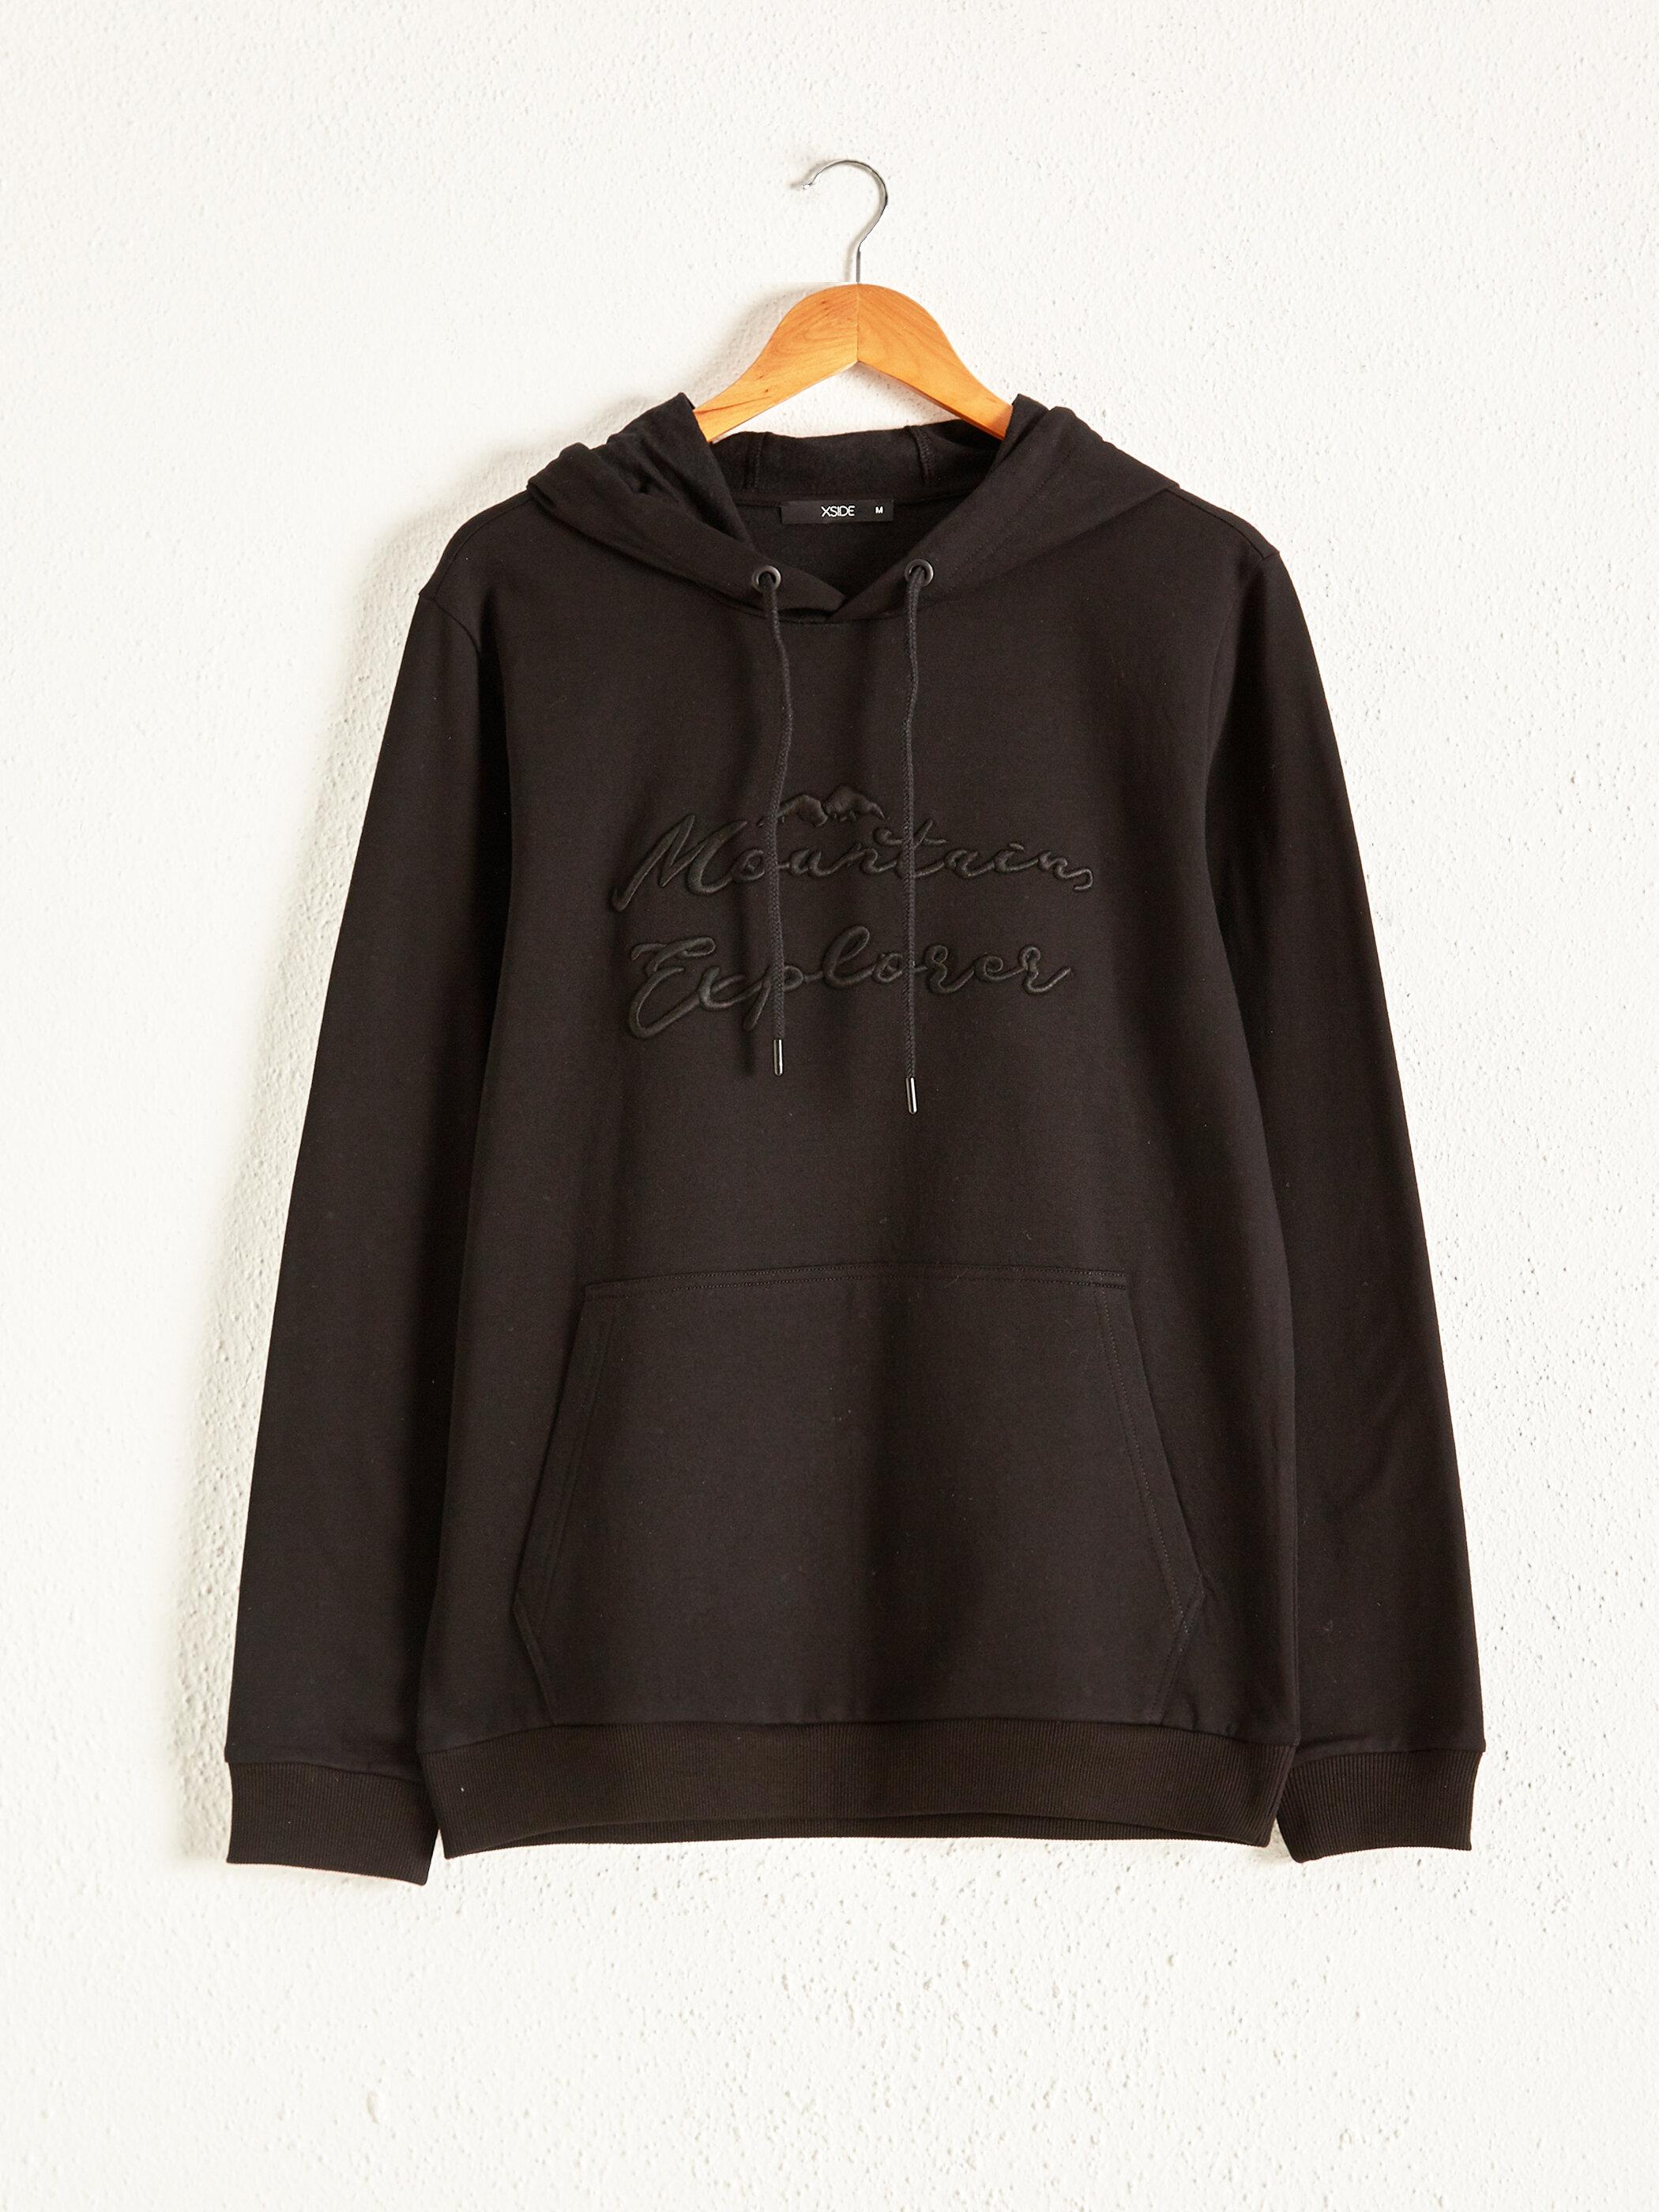 Kapüşonlu Baskılı Sweatshirt - LC WAIKIKI